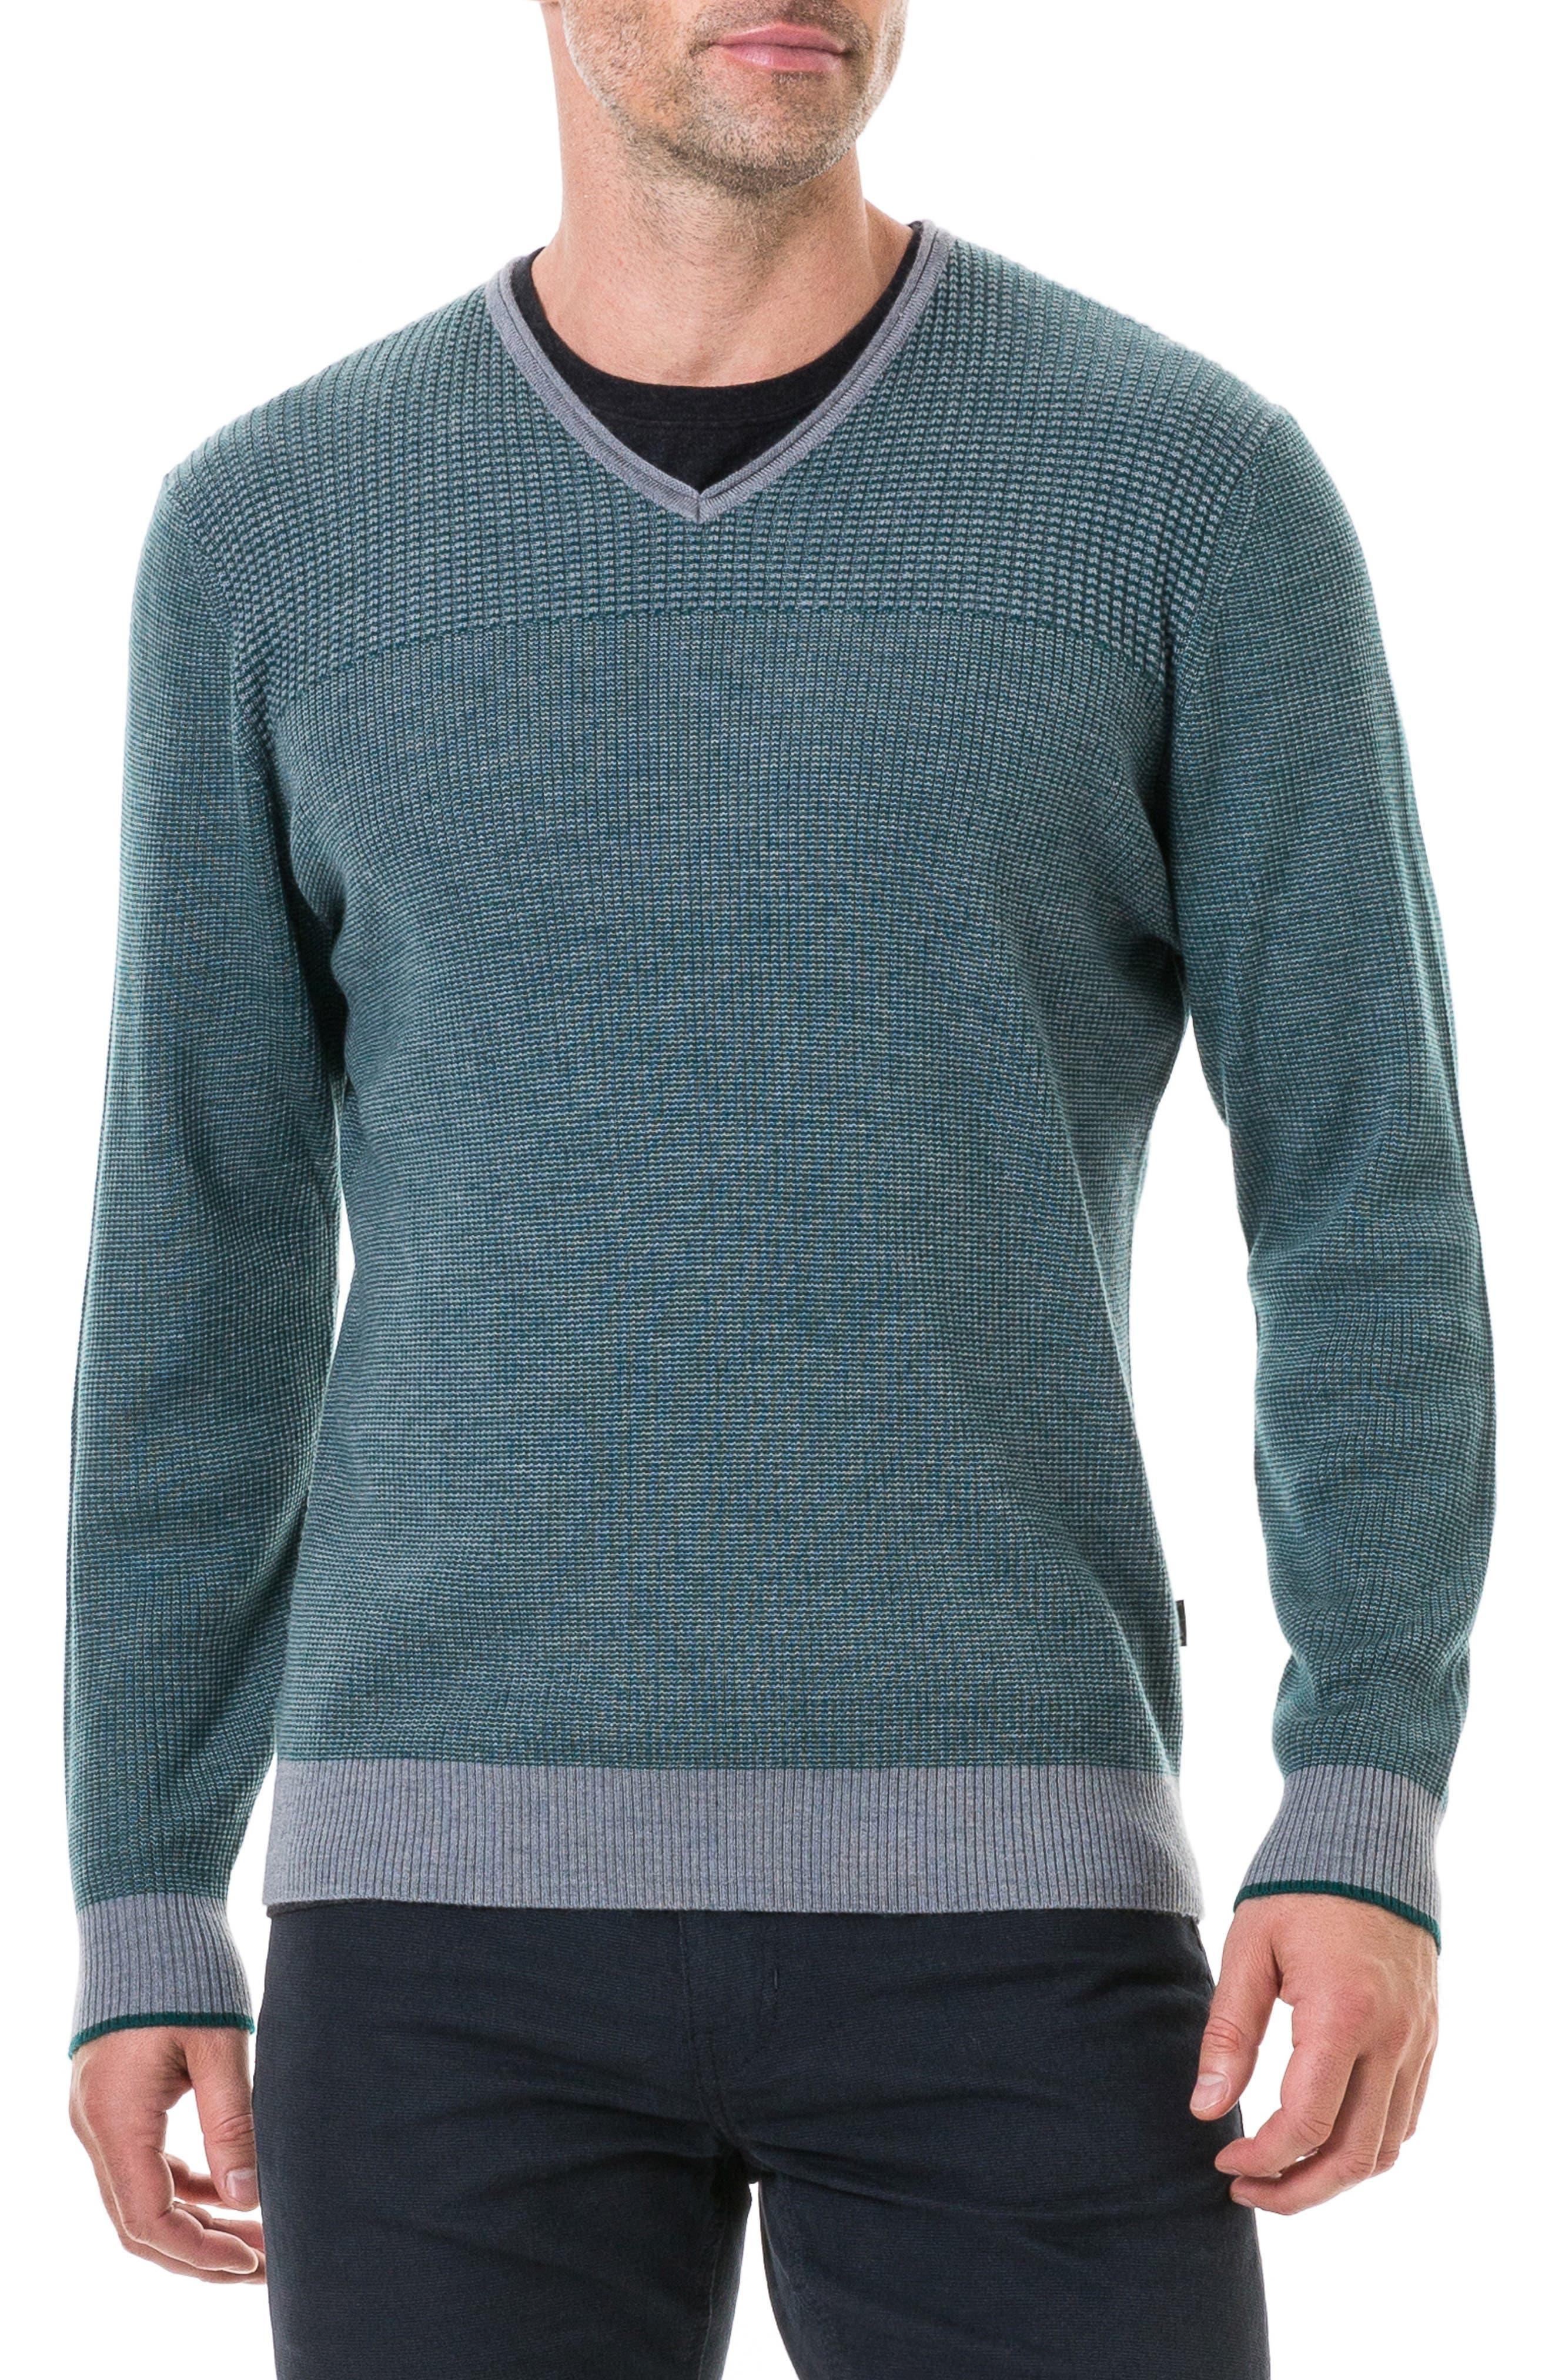 Image of RODD AND GUNN Clark Valley Wool Sweater